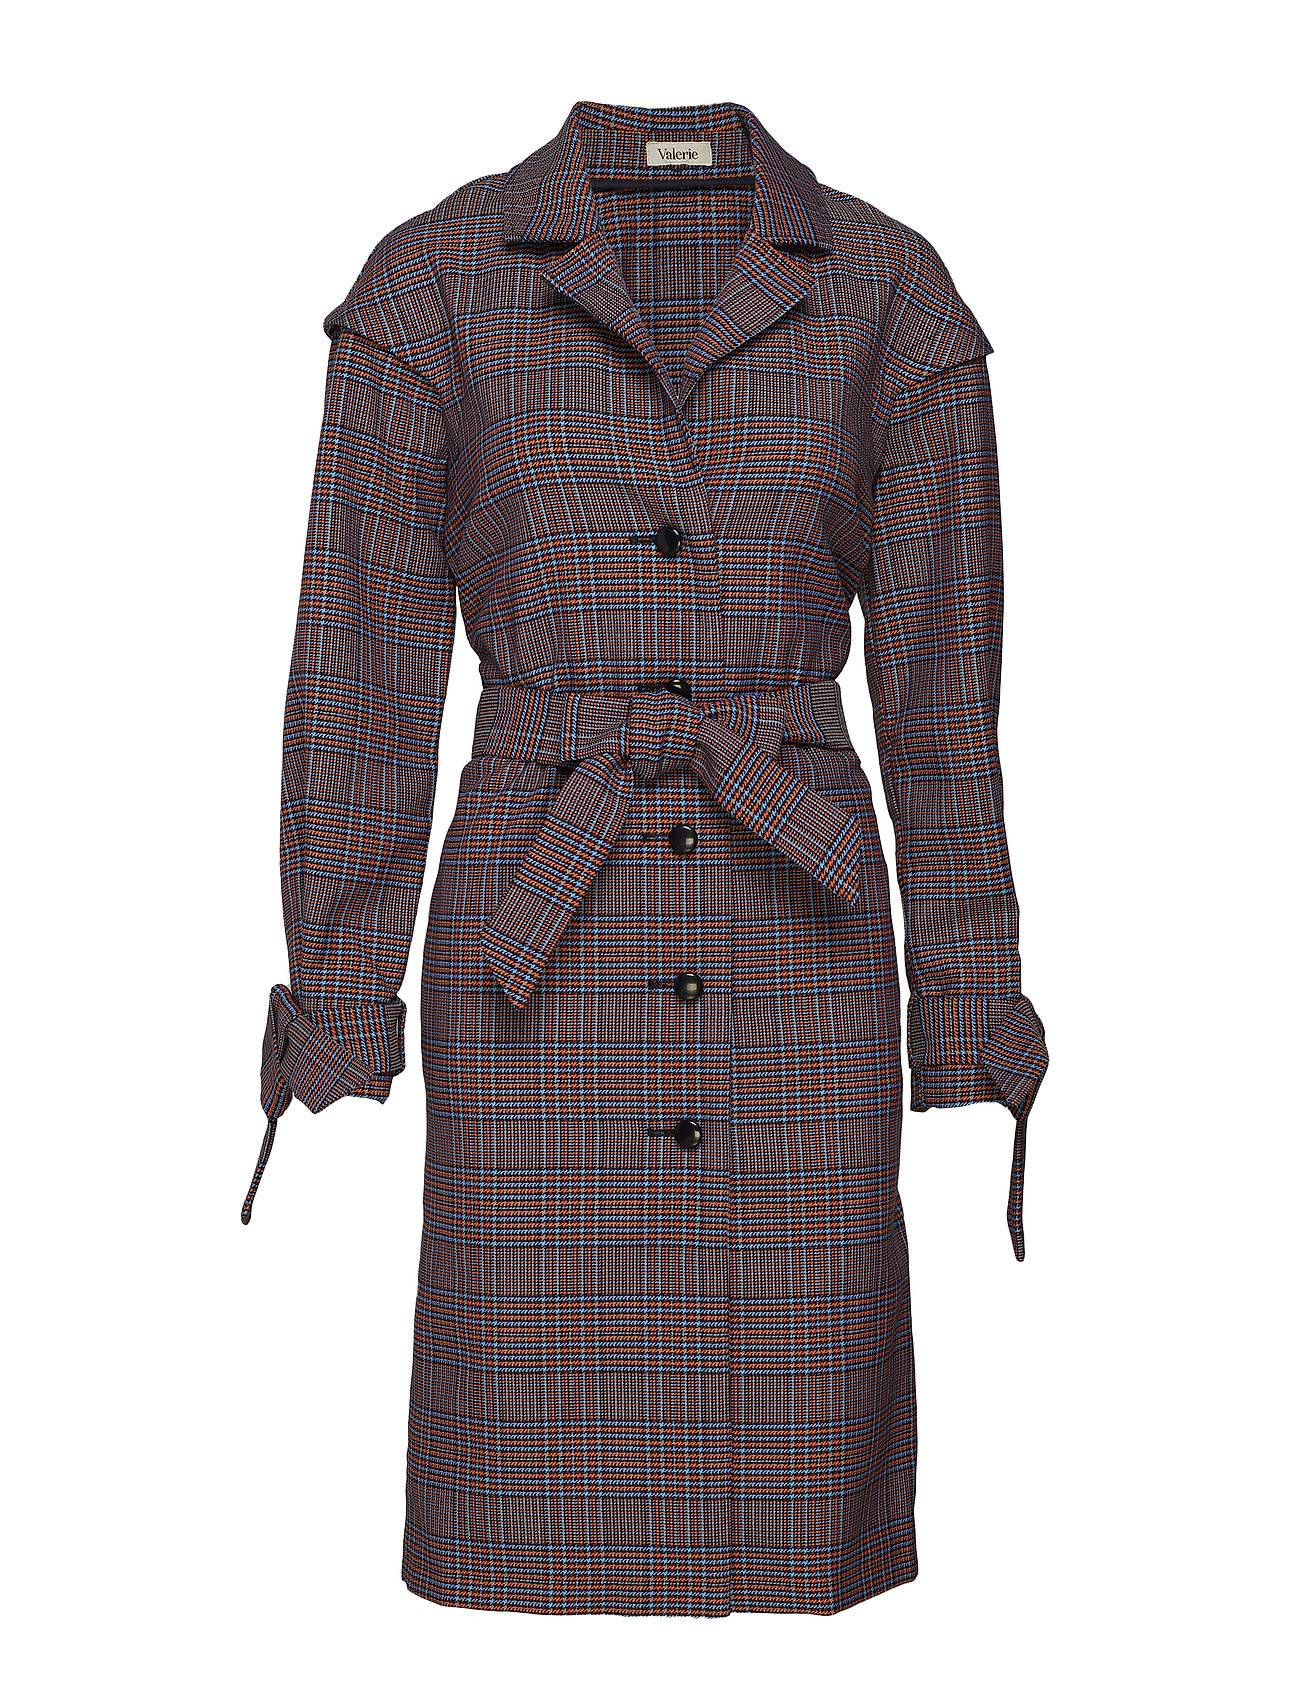 Valerie Grace Coat